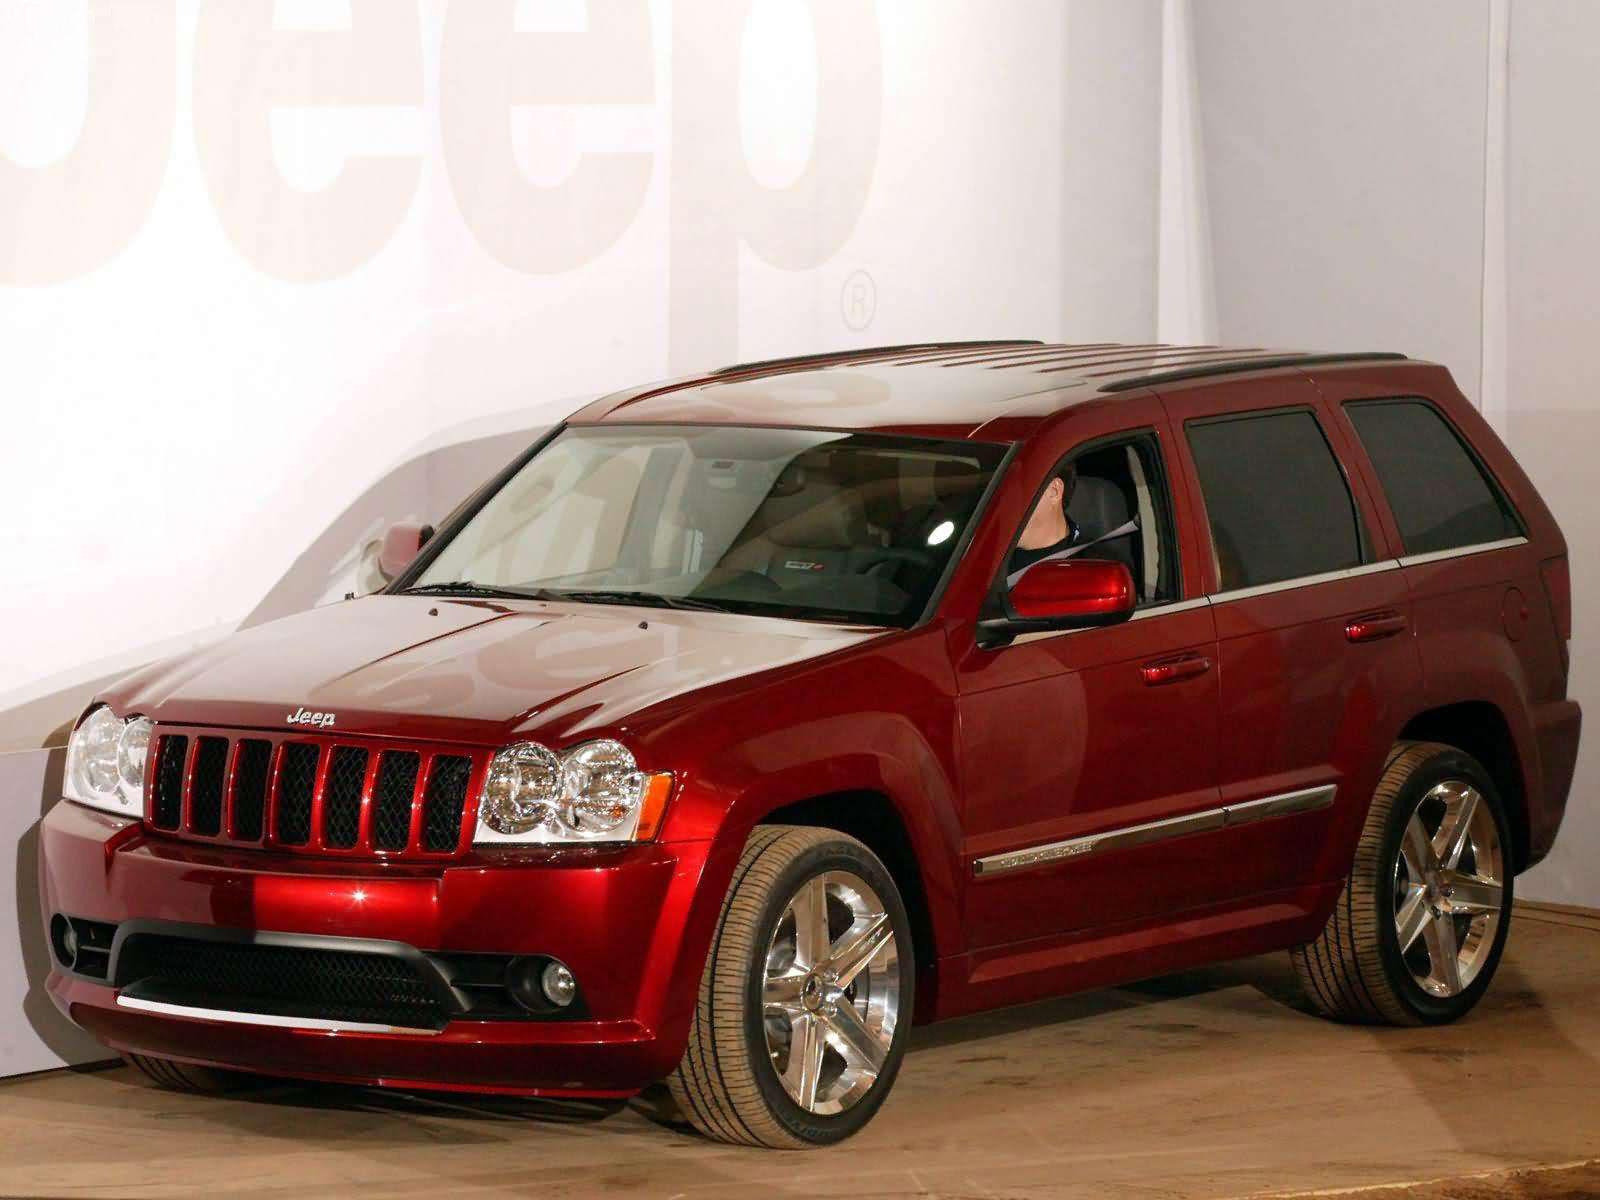 2006 jeep grand cherokee srt8 pictures. Black Bedroom Furniture Sets. Home Design Ideas